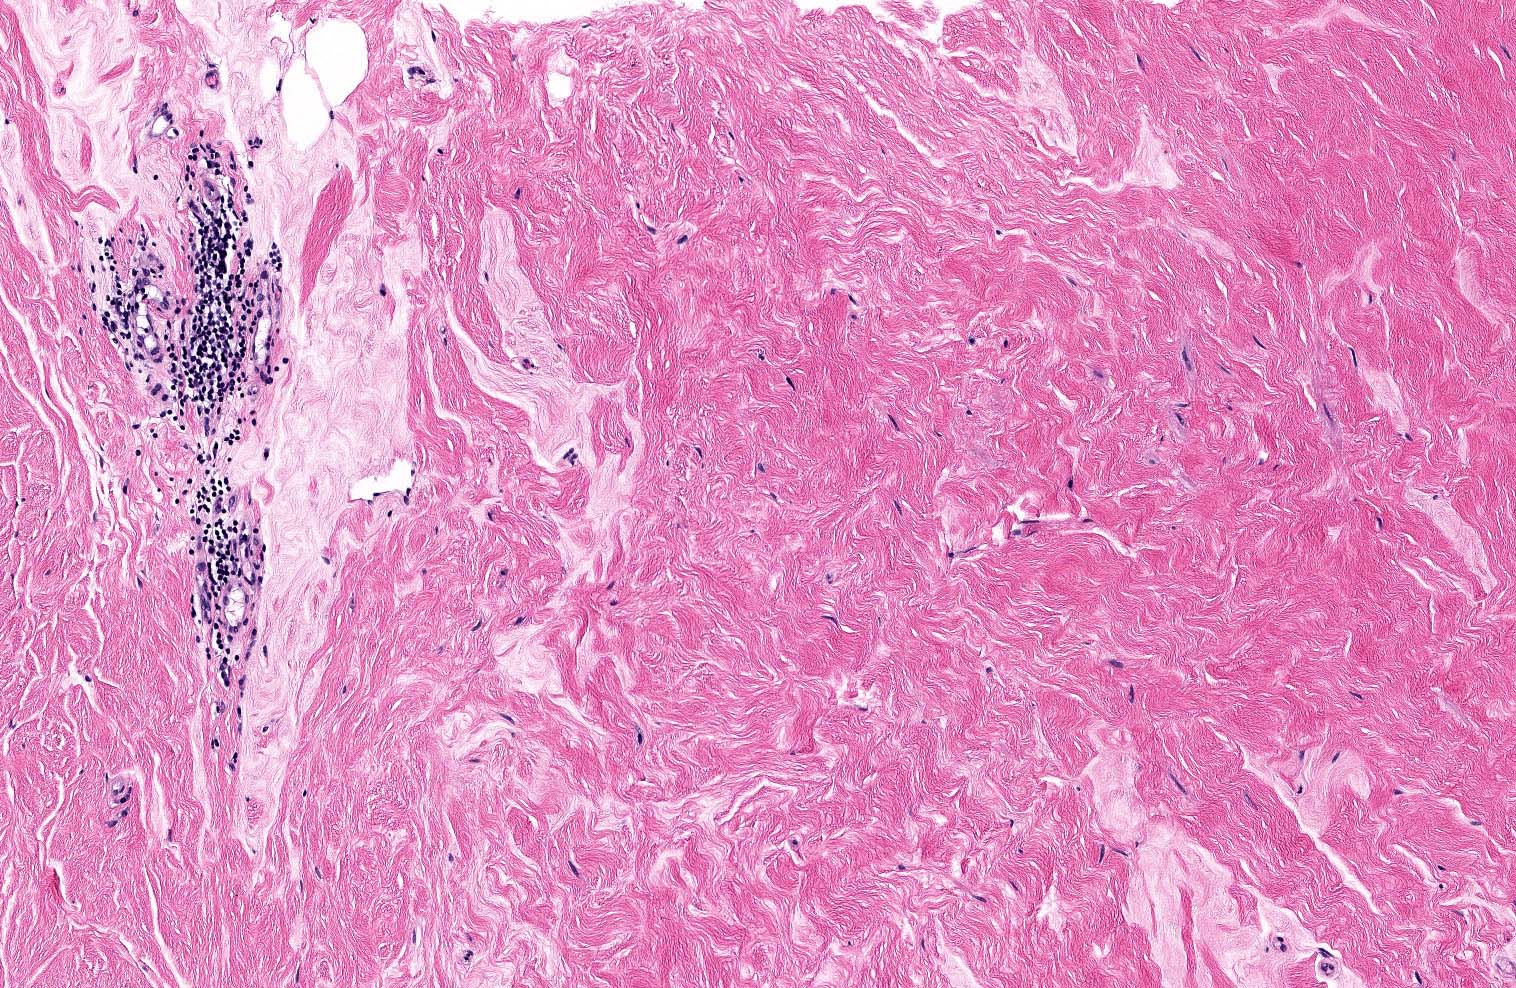 Perivascular lymphocytic inflammation